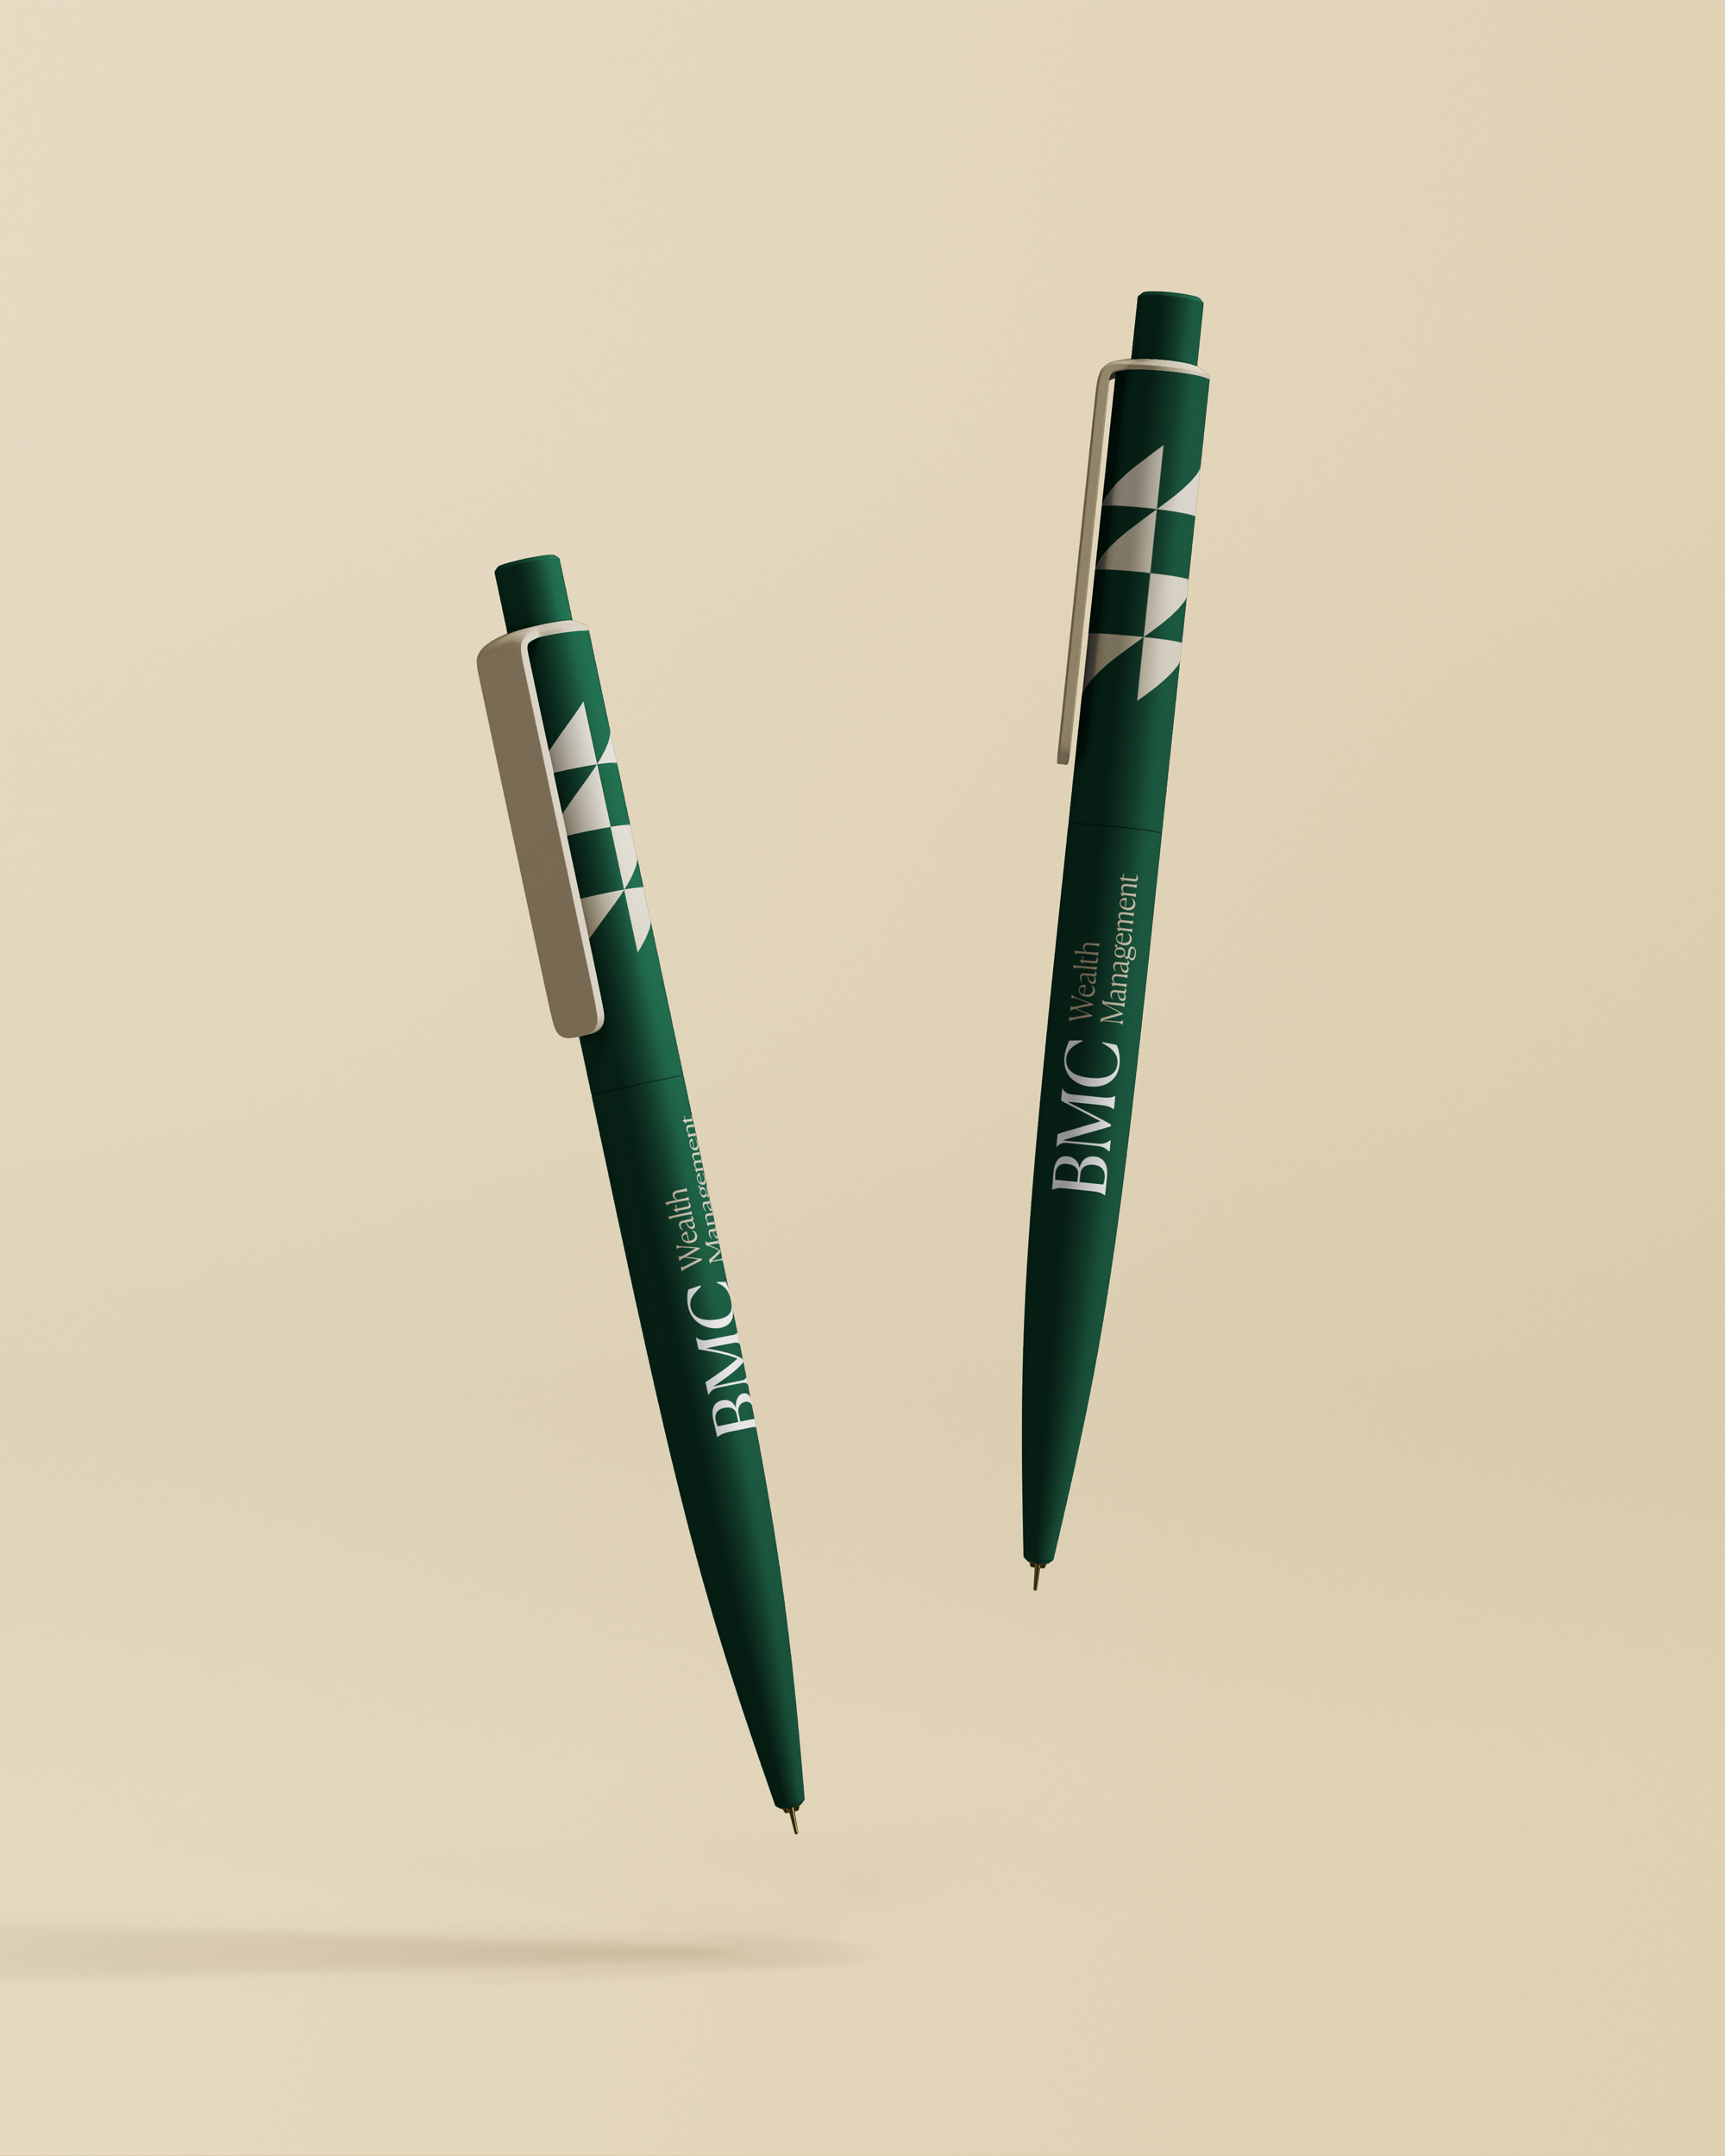 BMC Wealth Management branded pens